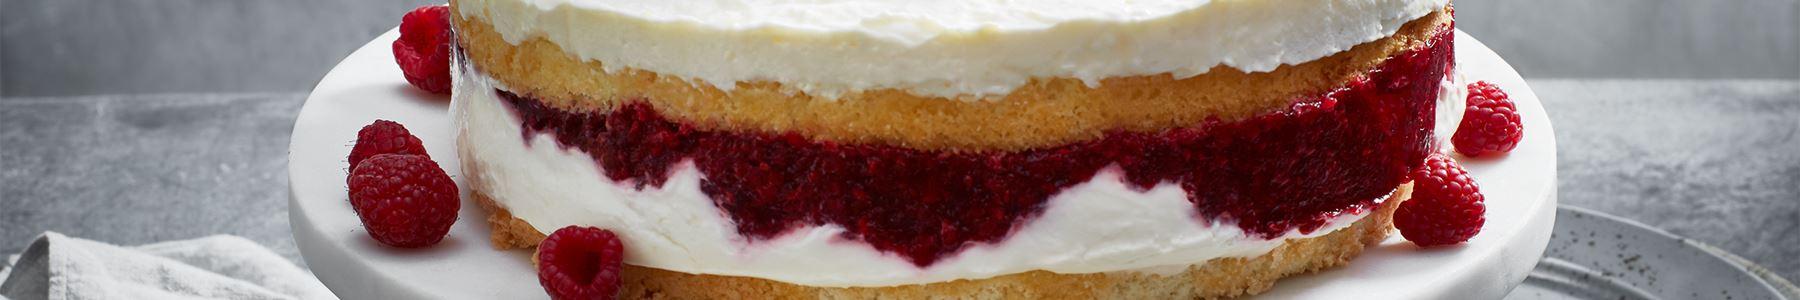 Frukter + Matlagningsyoghurt + Tårta